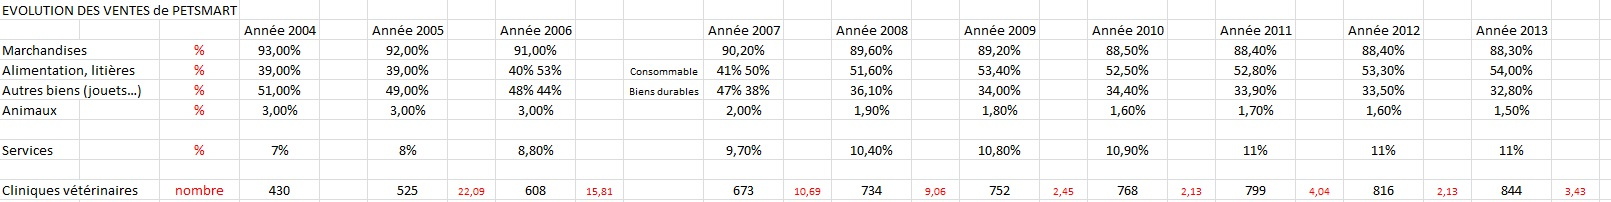 http://maxicool5.free.fr/Bourse/VALO%20PetSmart/Evo%20ventes%20PS.jpg